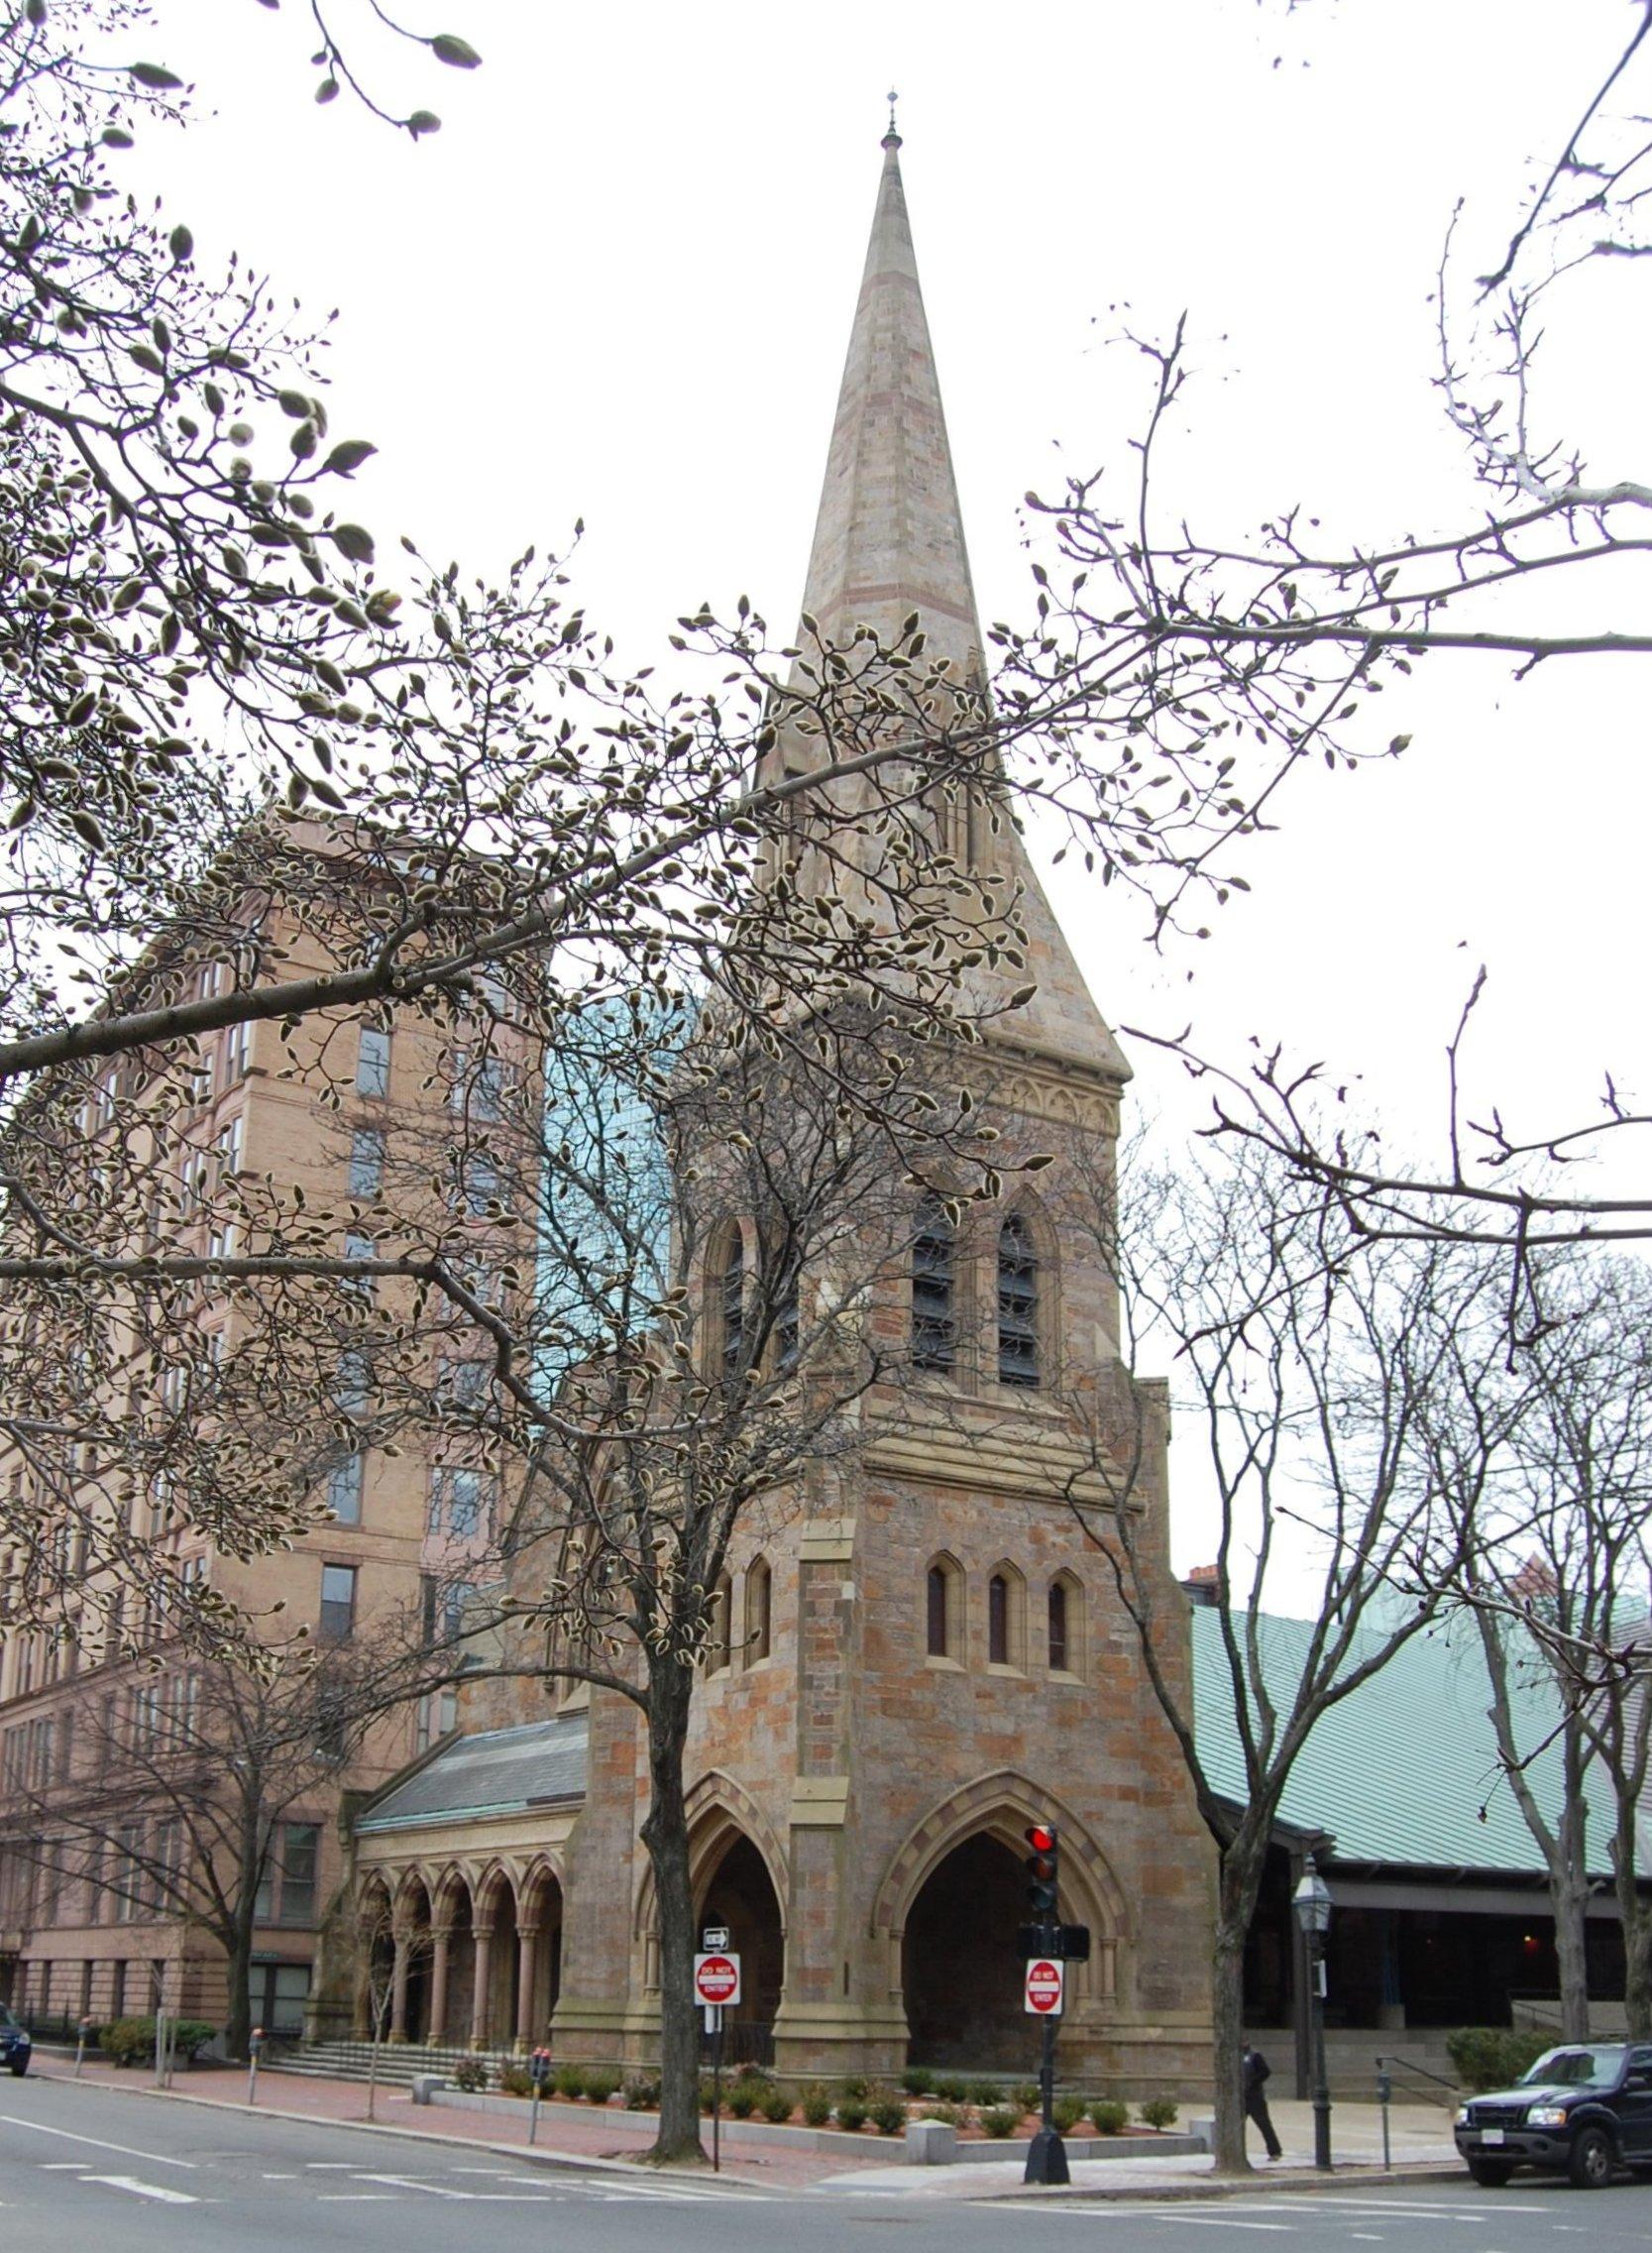 60 64 marlborough 294 berkeley first church boston for First ch